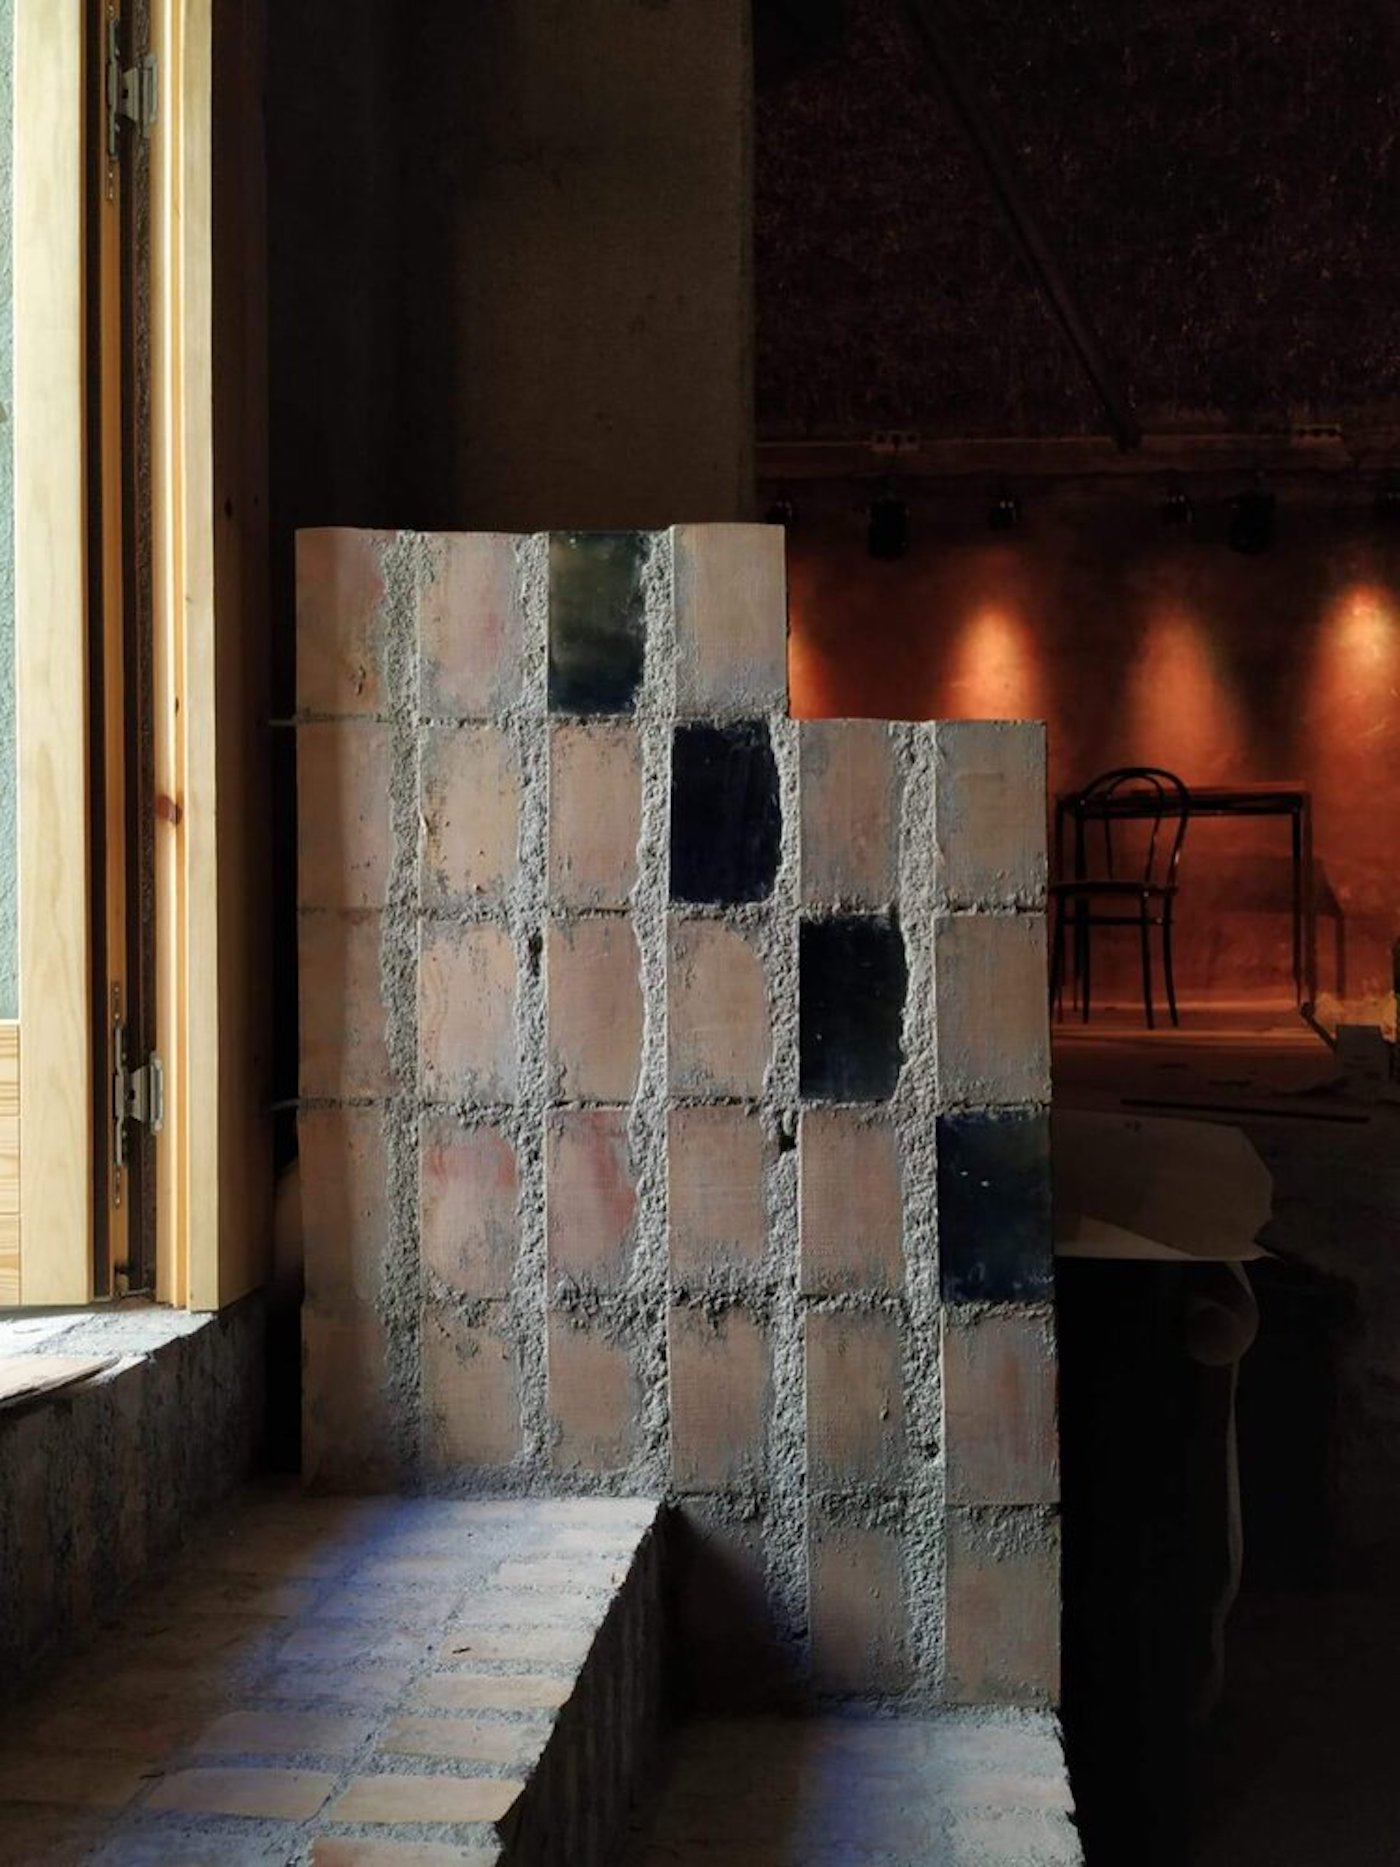 Mixed recycled bricks on wall and brick steps